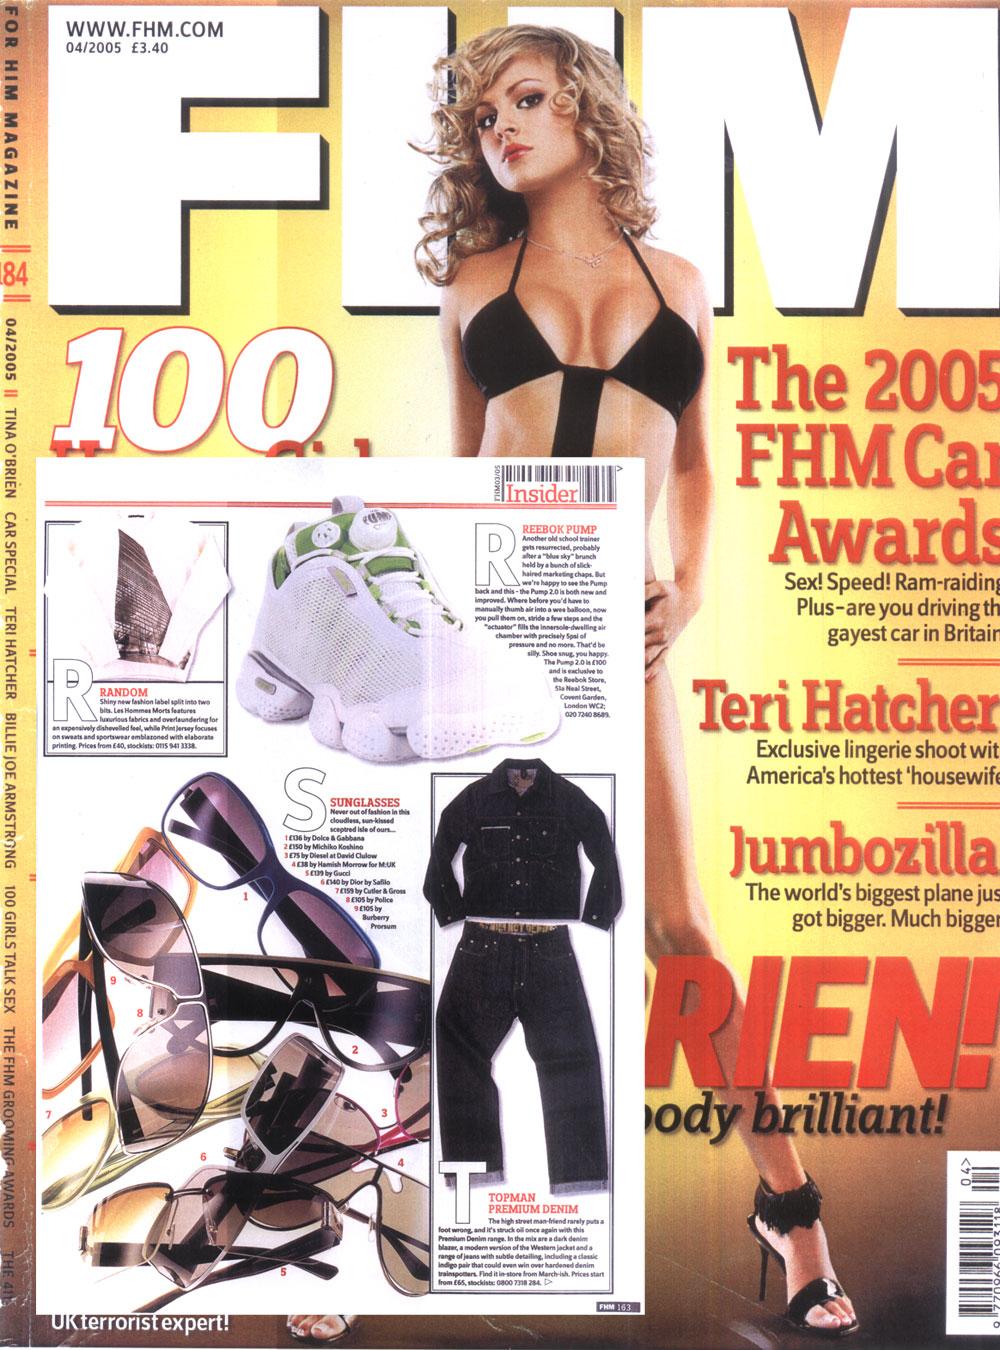 FHM-cover-04_05.jpg